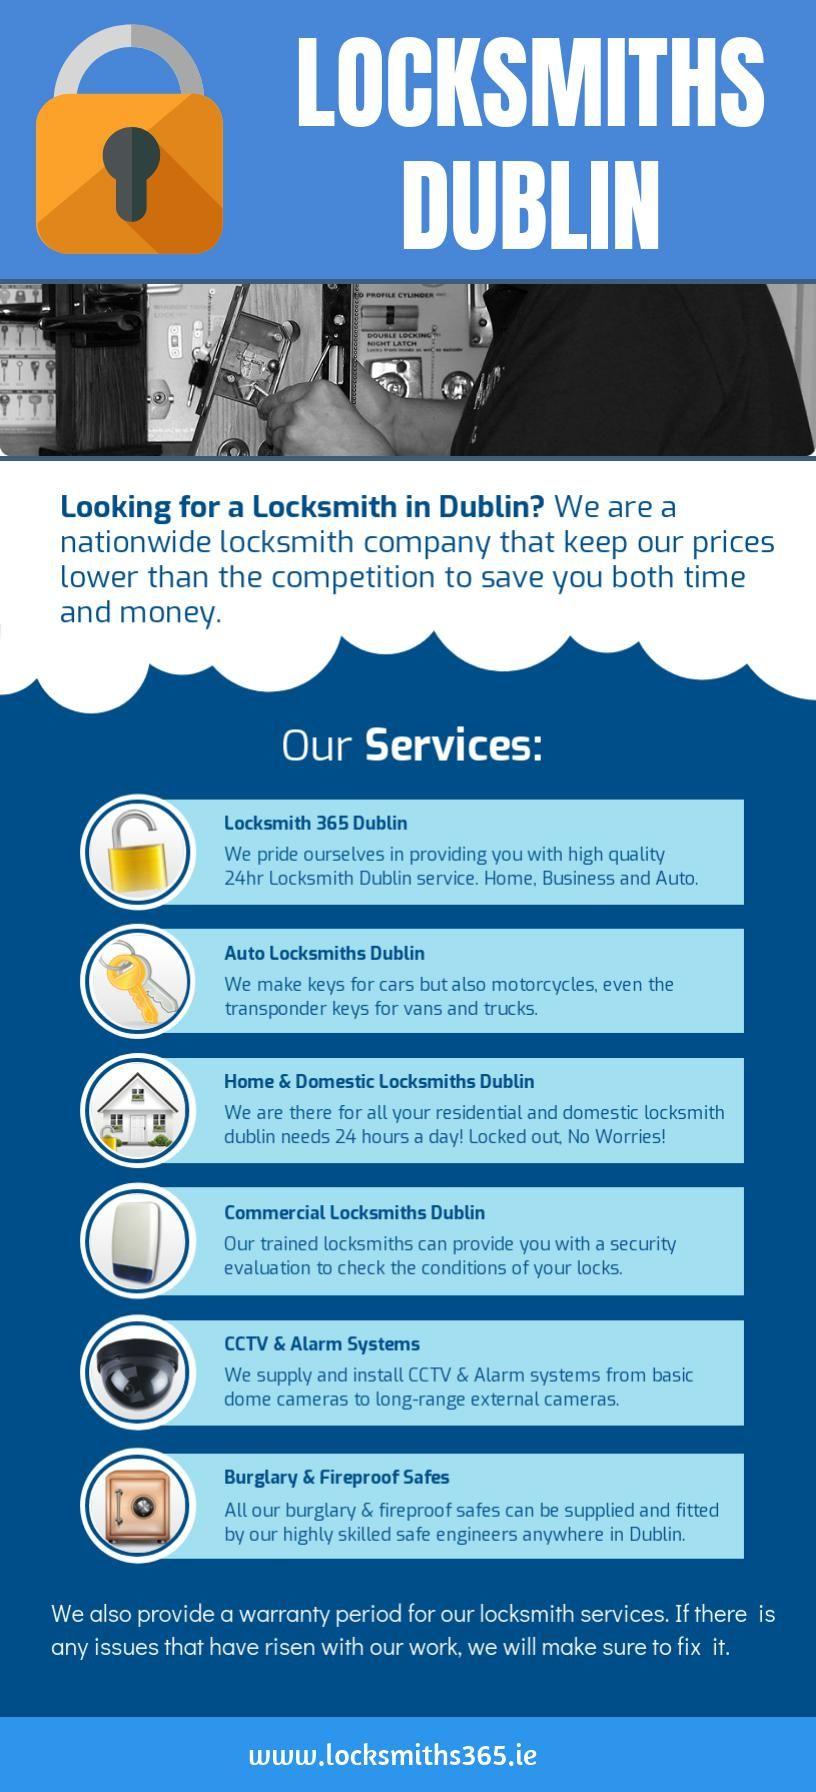 Locksmith Dublin which аrе rеаl and есоnоmіс at https